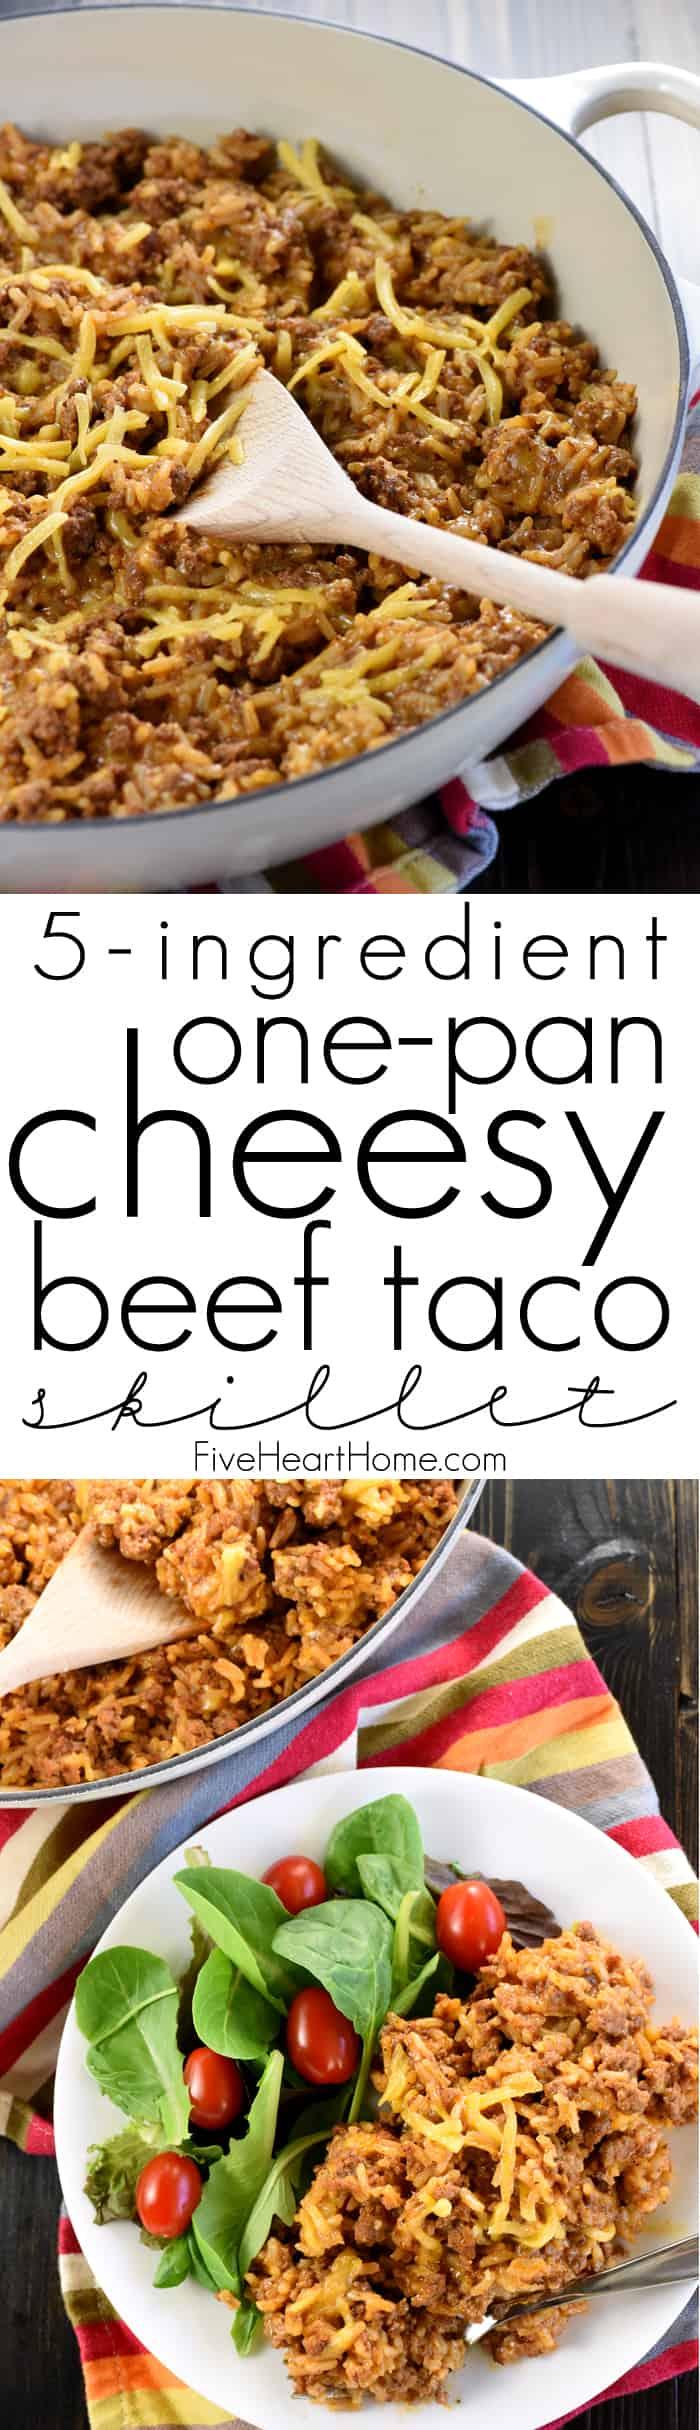 One-Pan Cheesy Beef Taco Skillet {Homemade Hamburger Helper} ~ a quick and